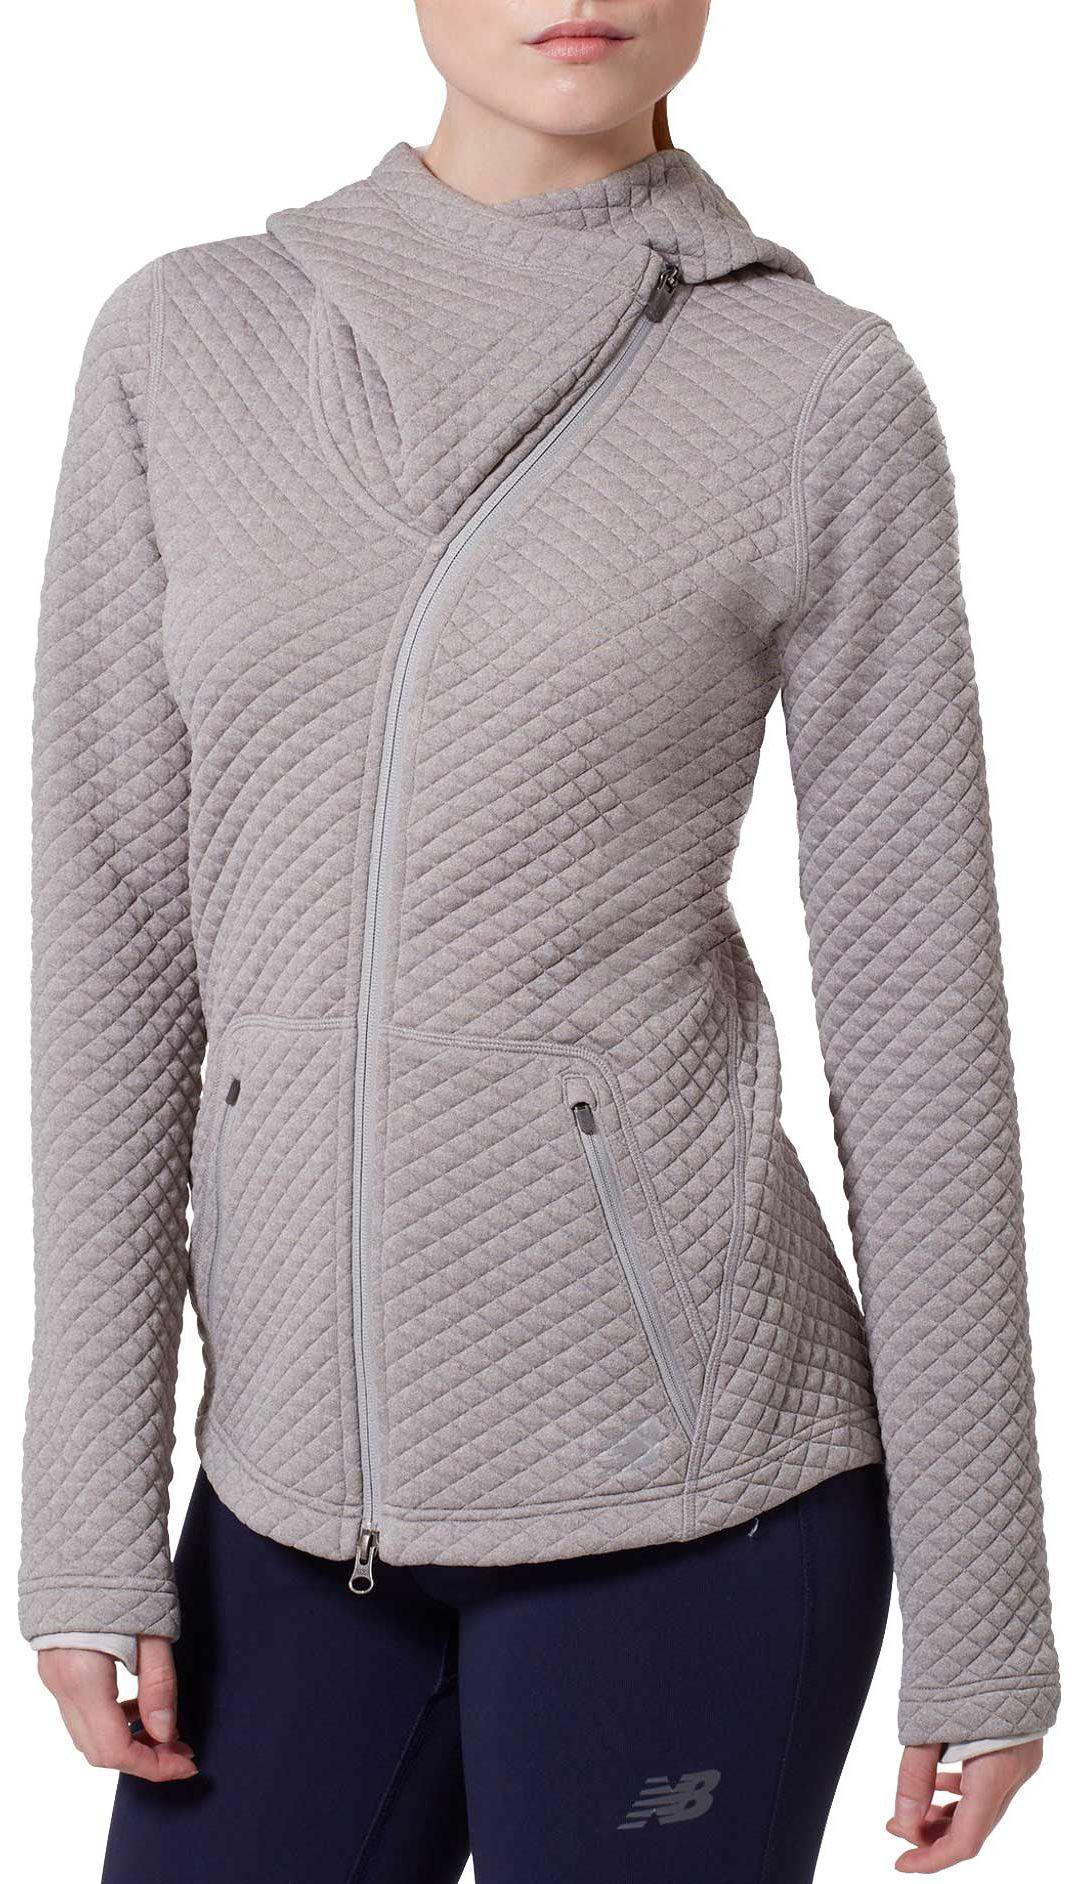 b6f1e887eba27 New Balance Women's Heat Loft Asymmetrical Full-Zip Jacket | DICK'S ...